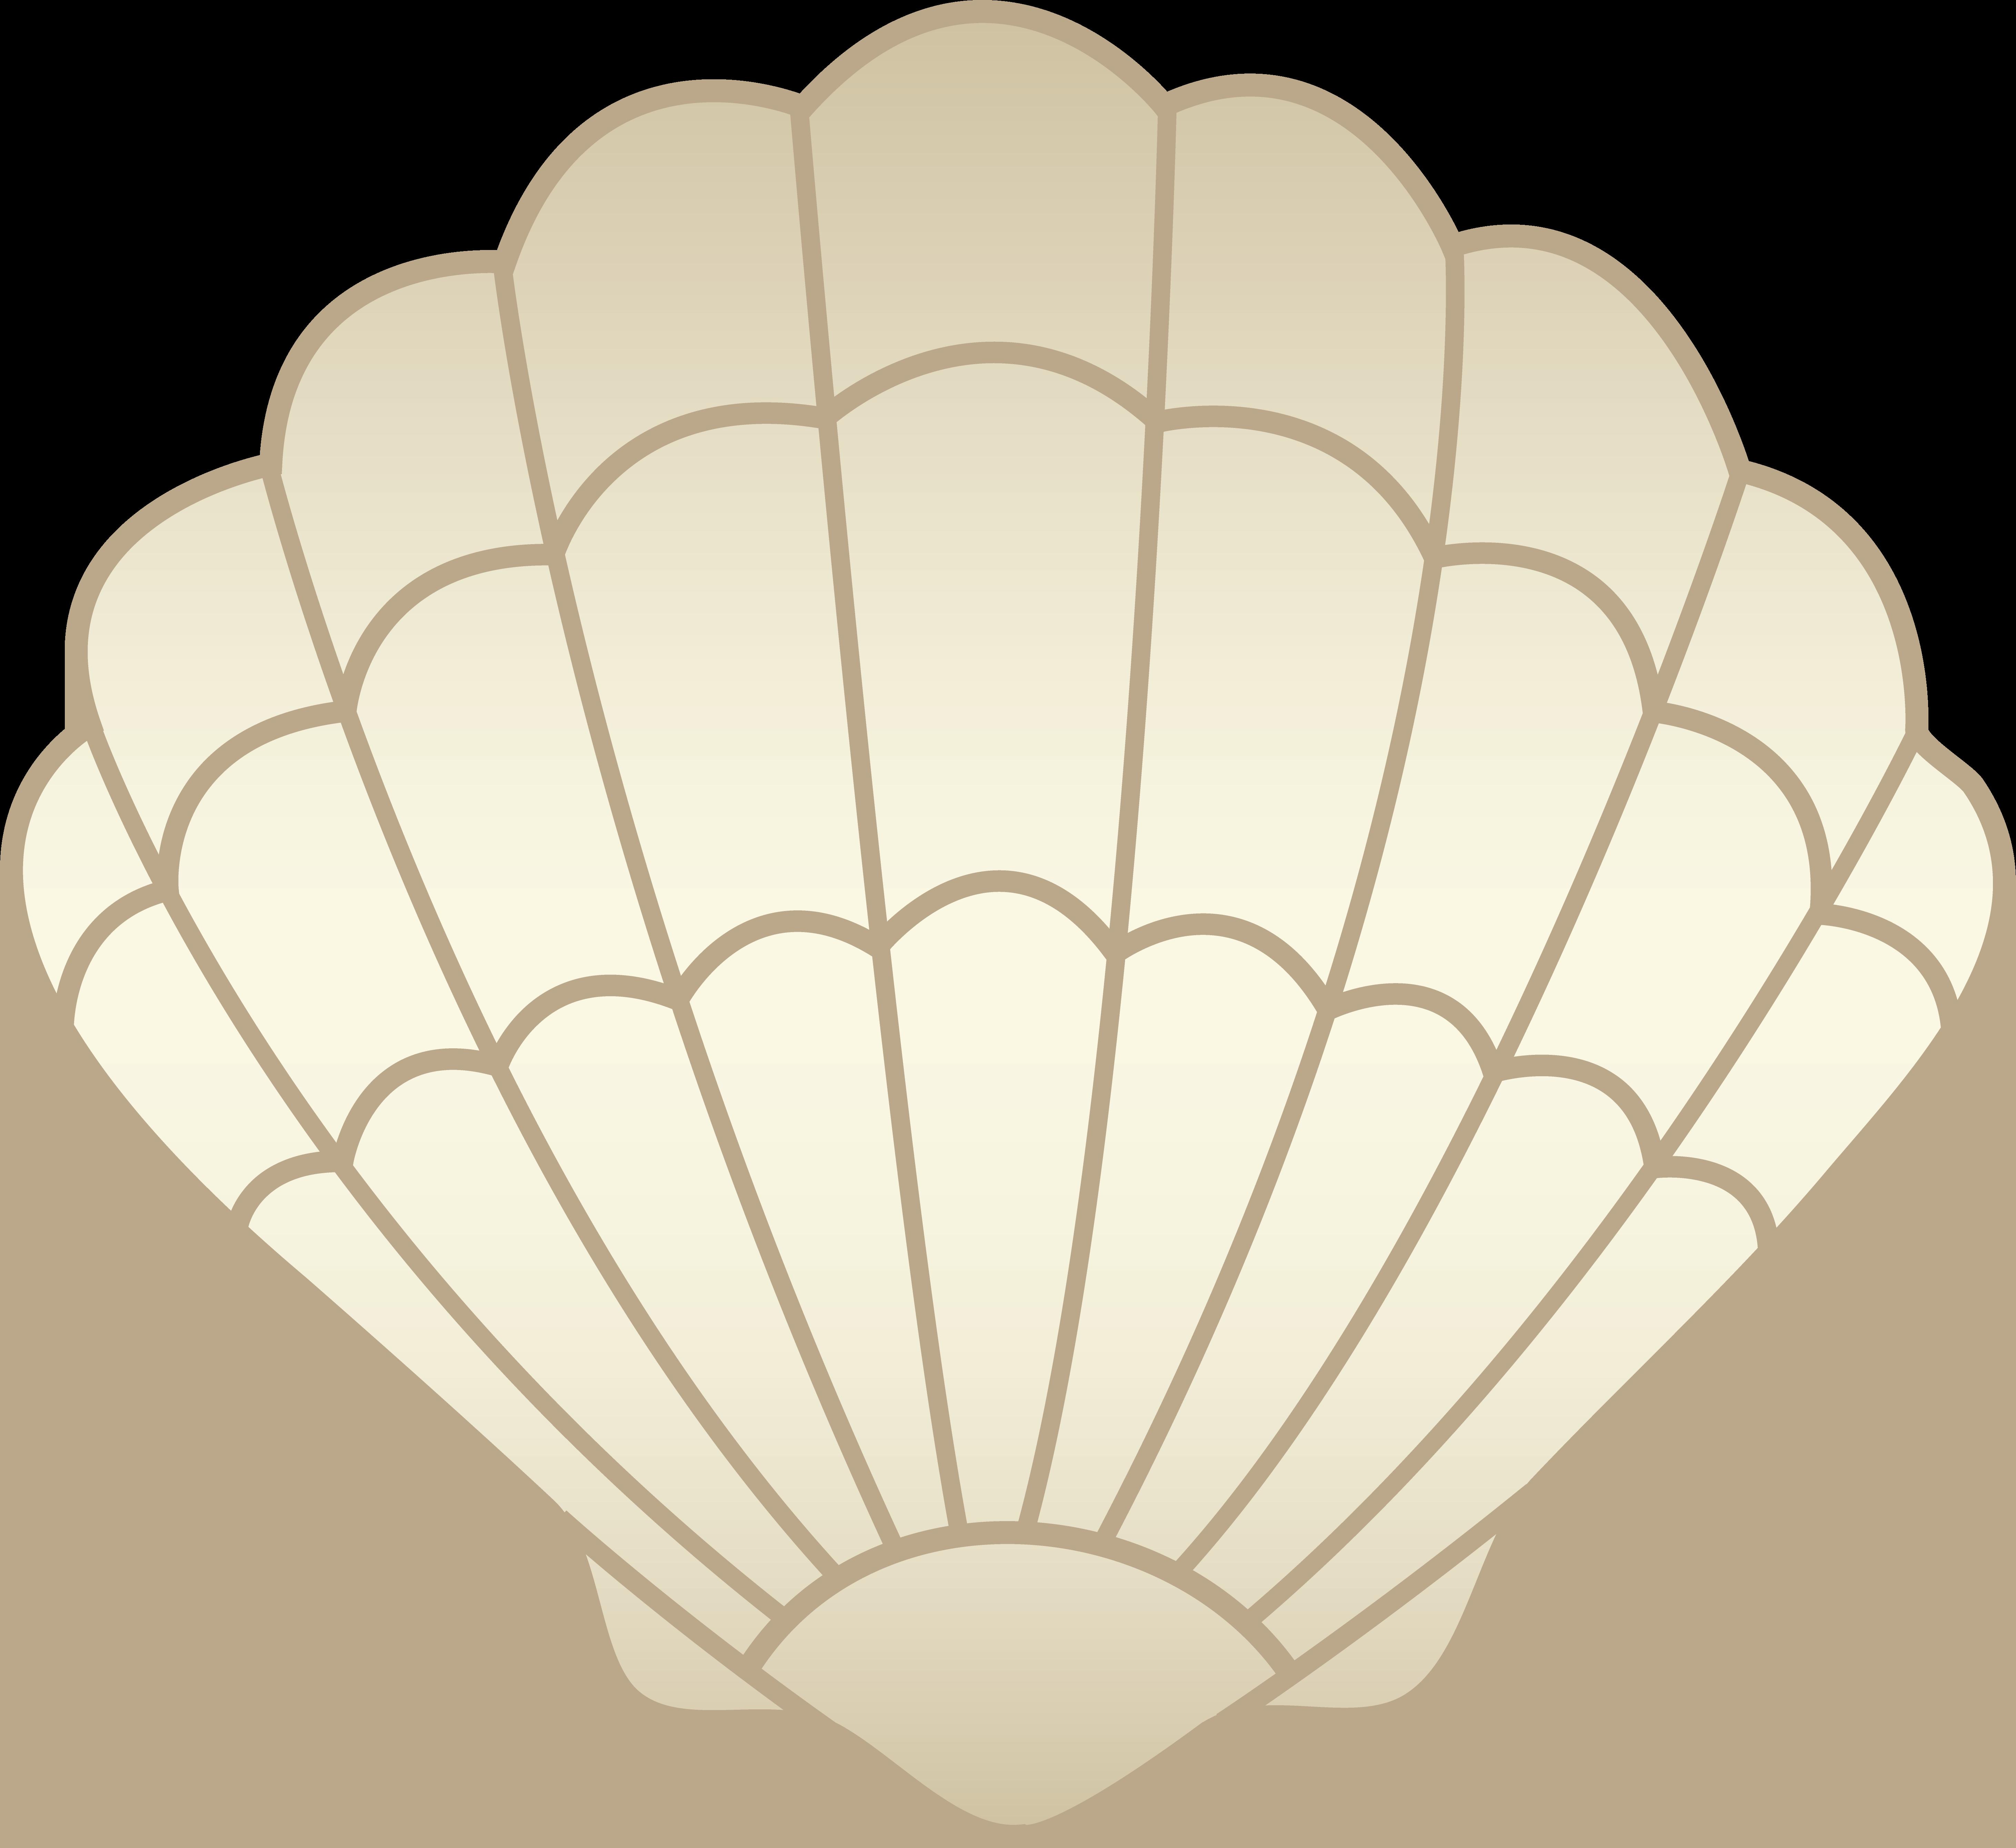 Beige seashell free clip. Shell clipart vector